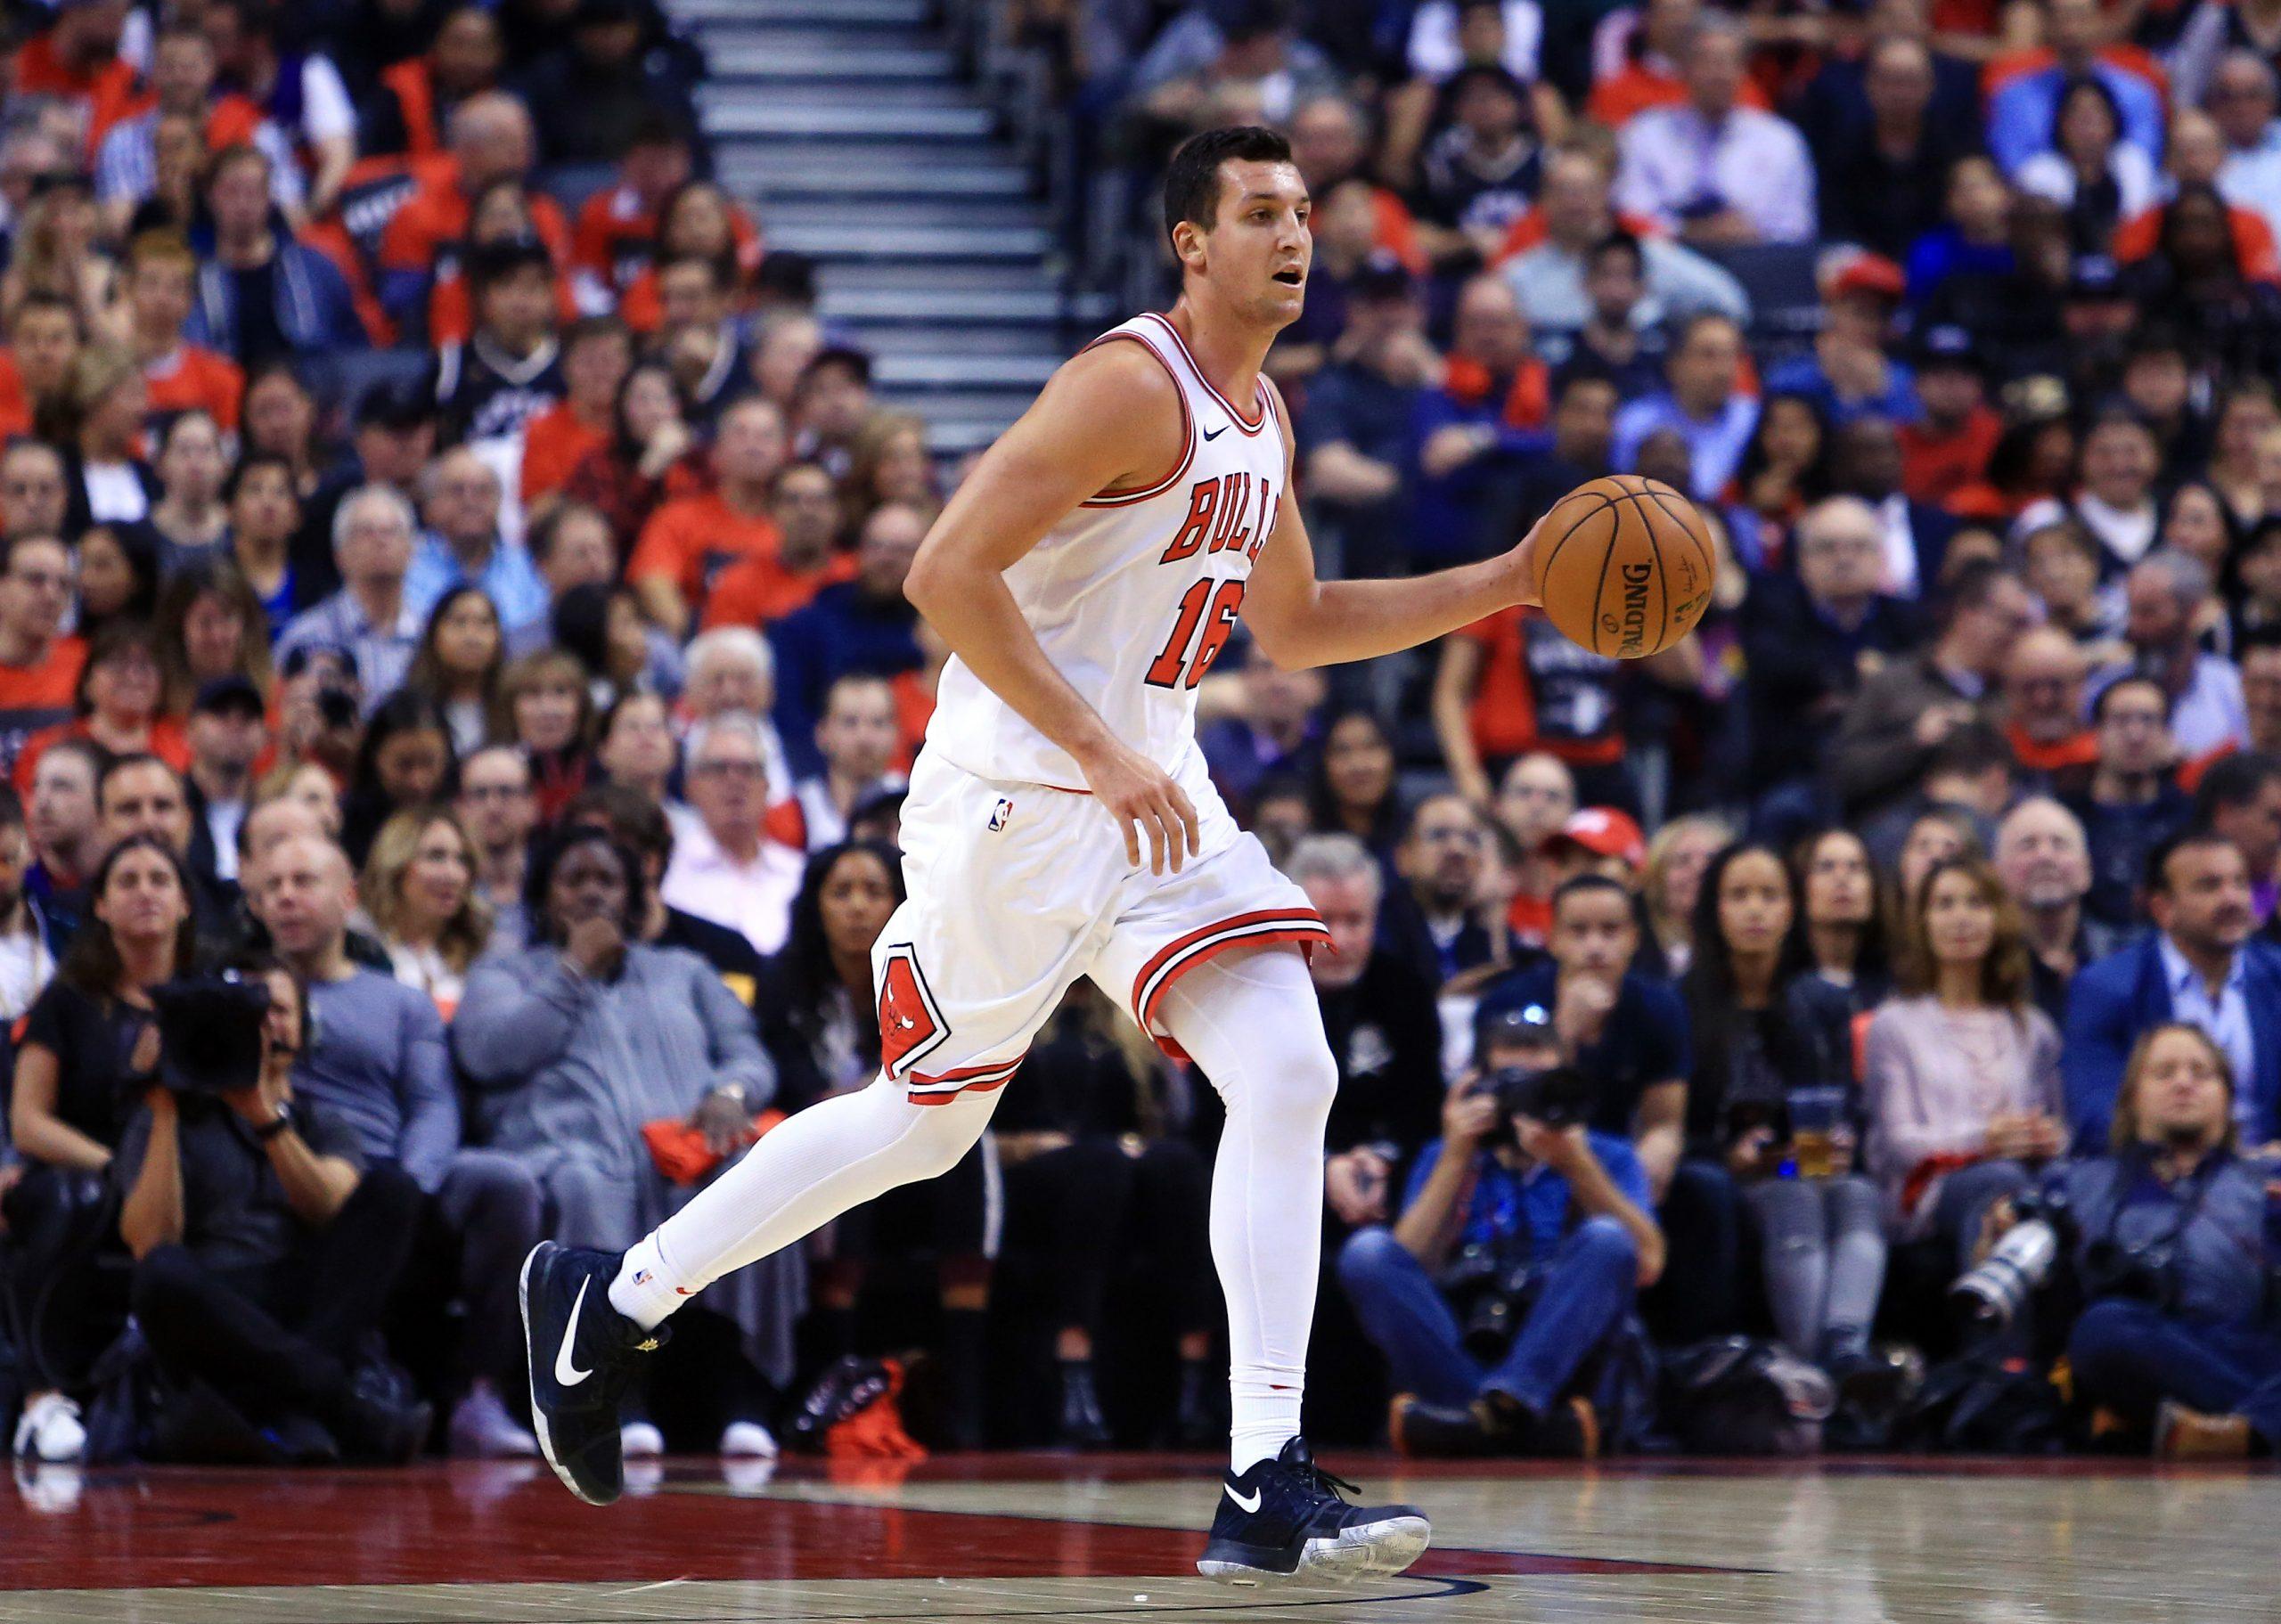 Wegen Gehirnblutung: Notoperation bei Basketball-Nationalspieler Zipser